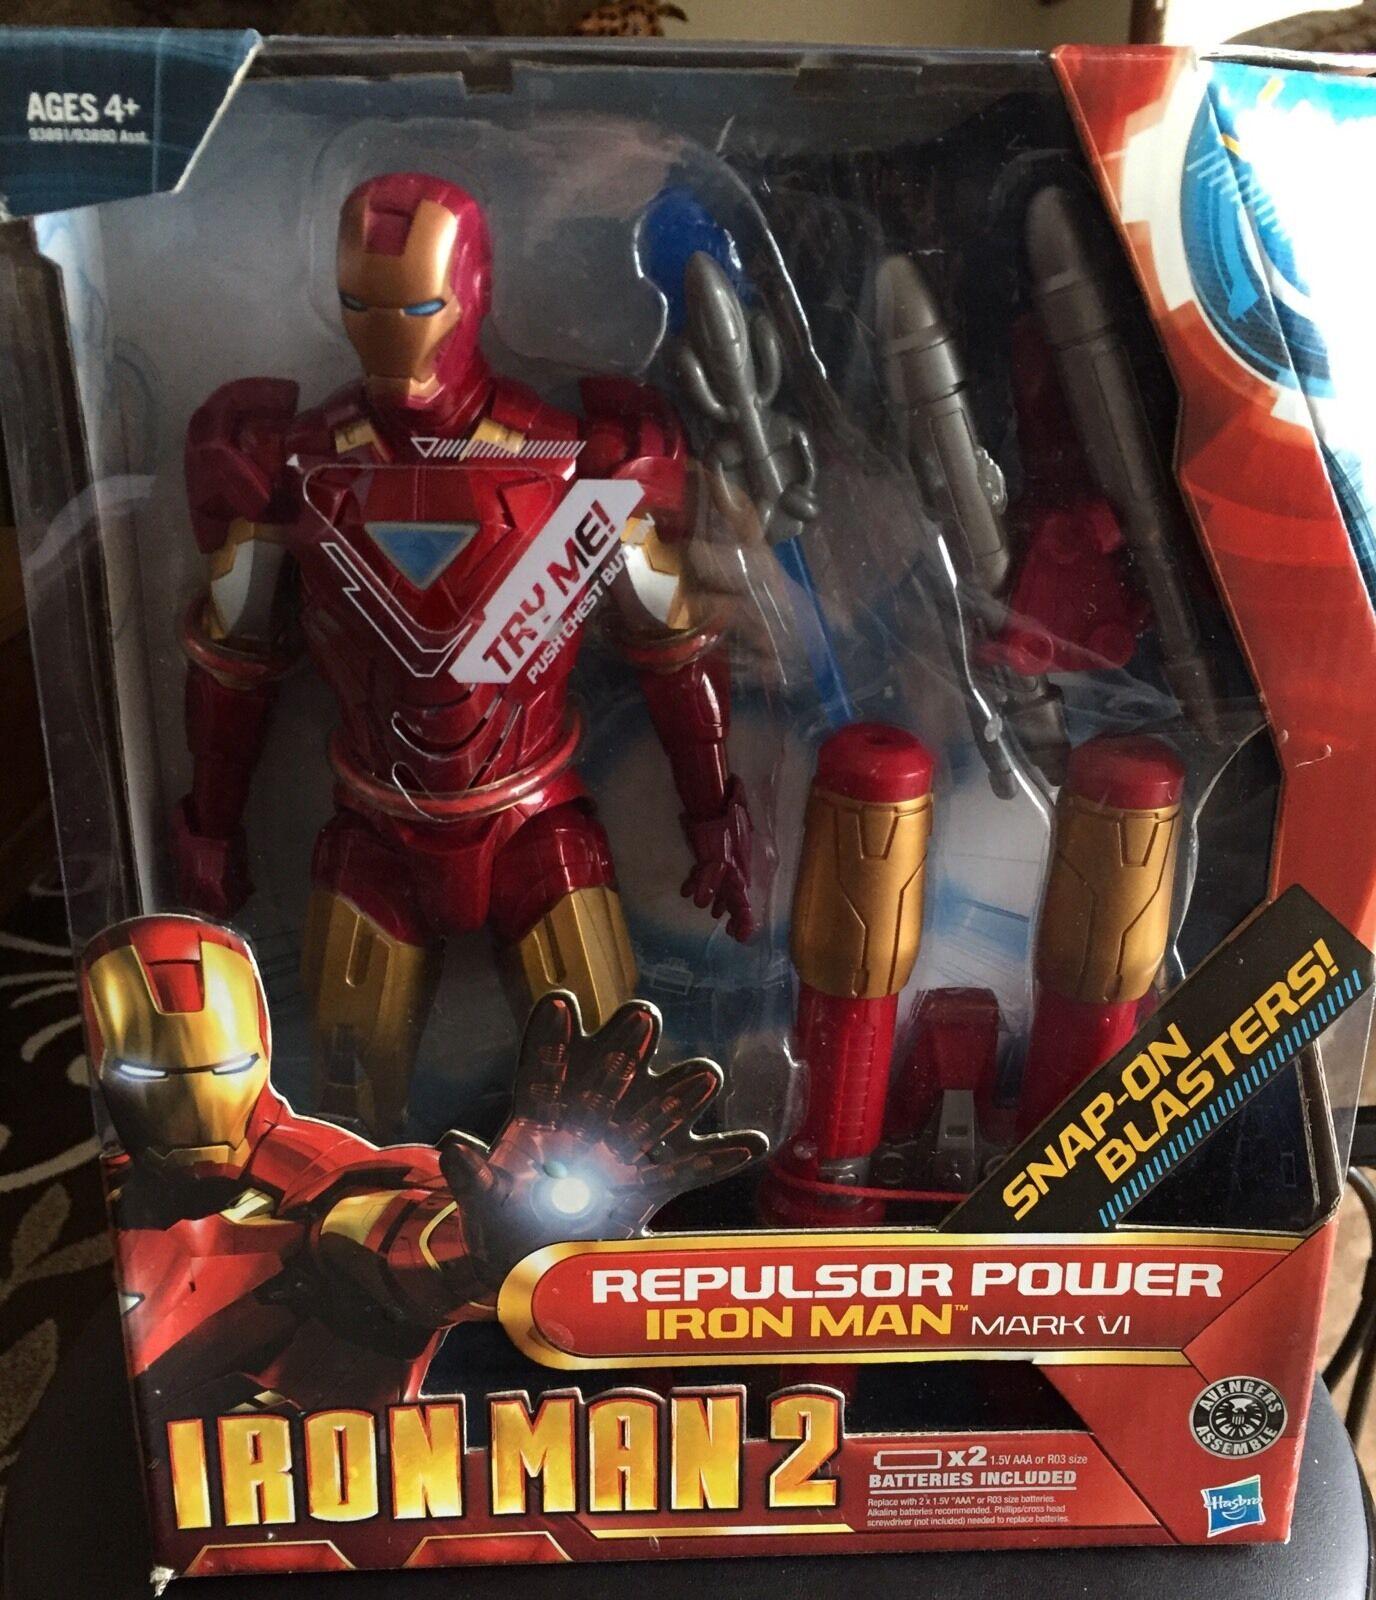 IRON MAN 2 Repulsor Power IRON MAN VI 10